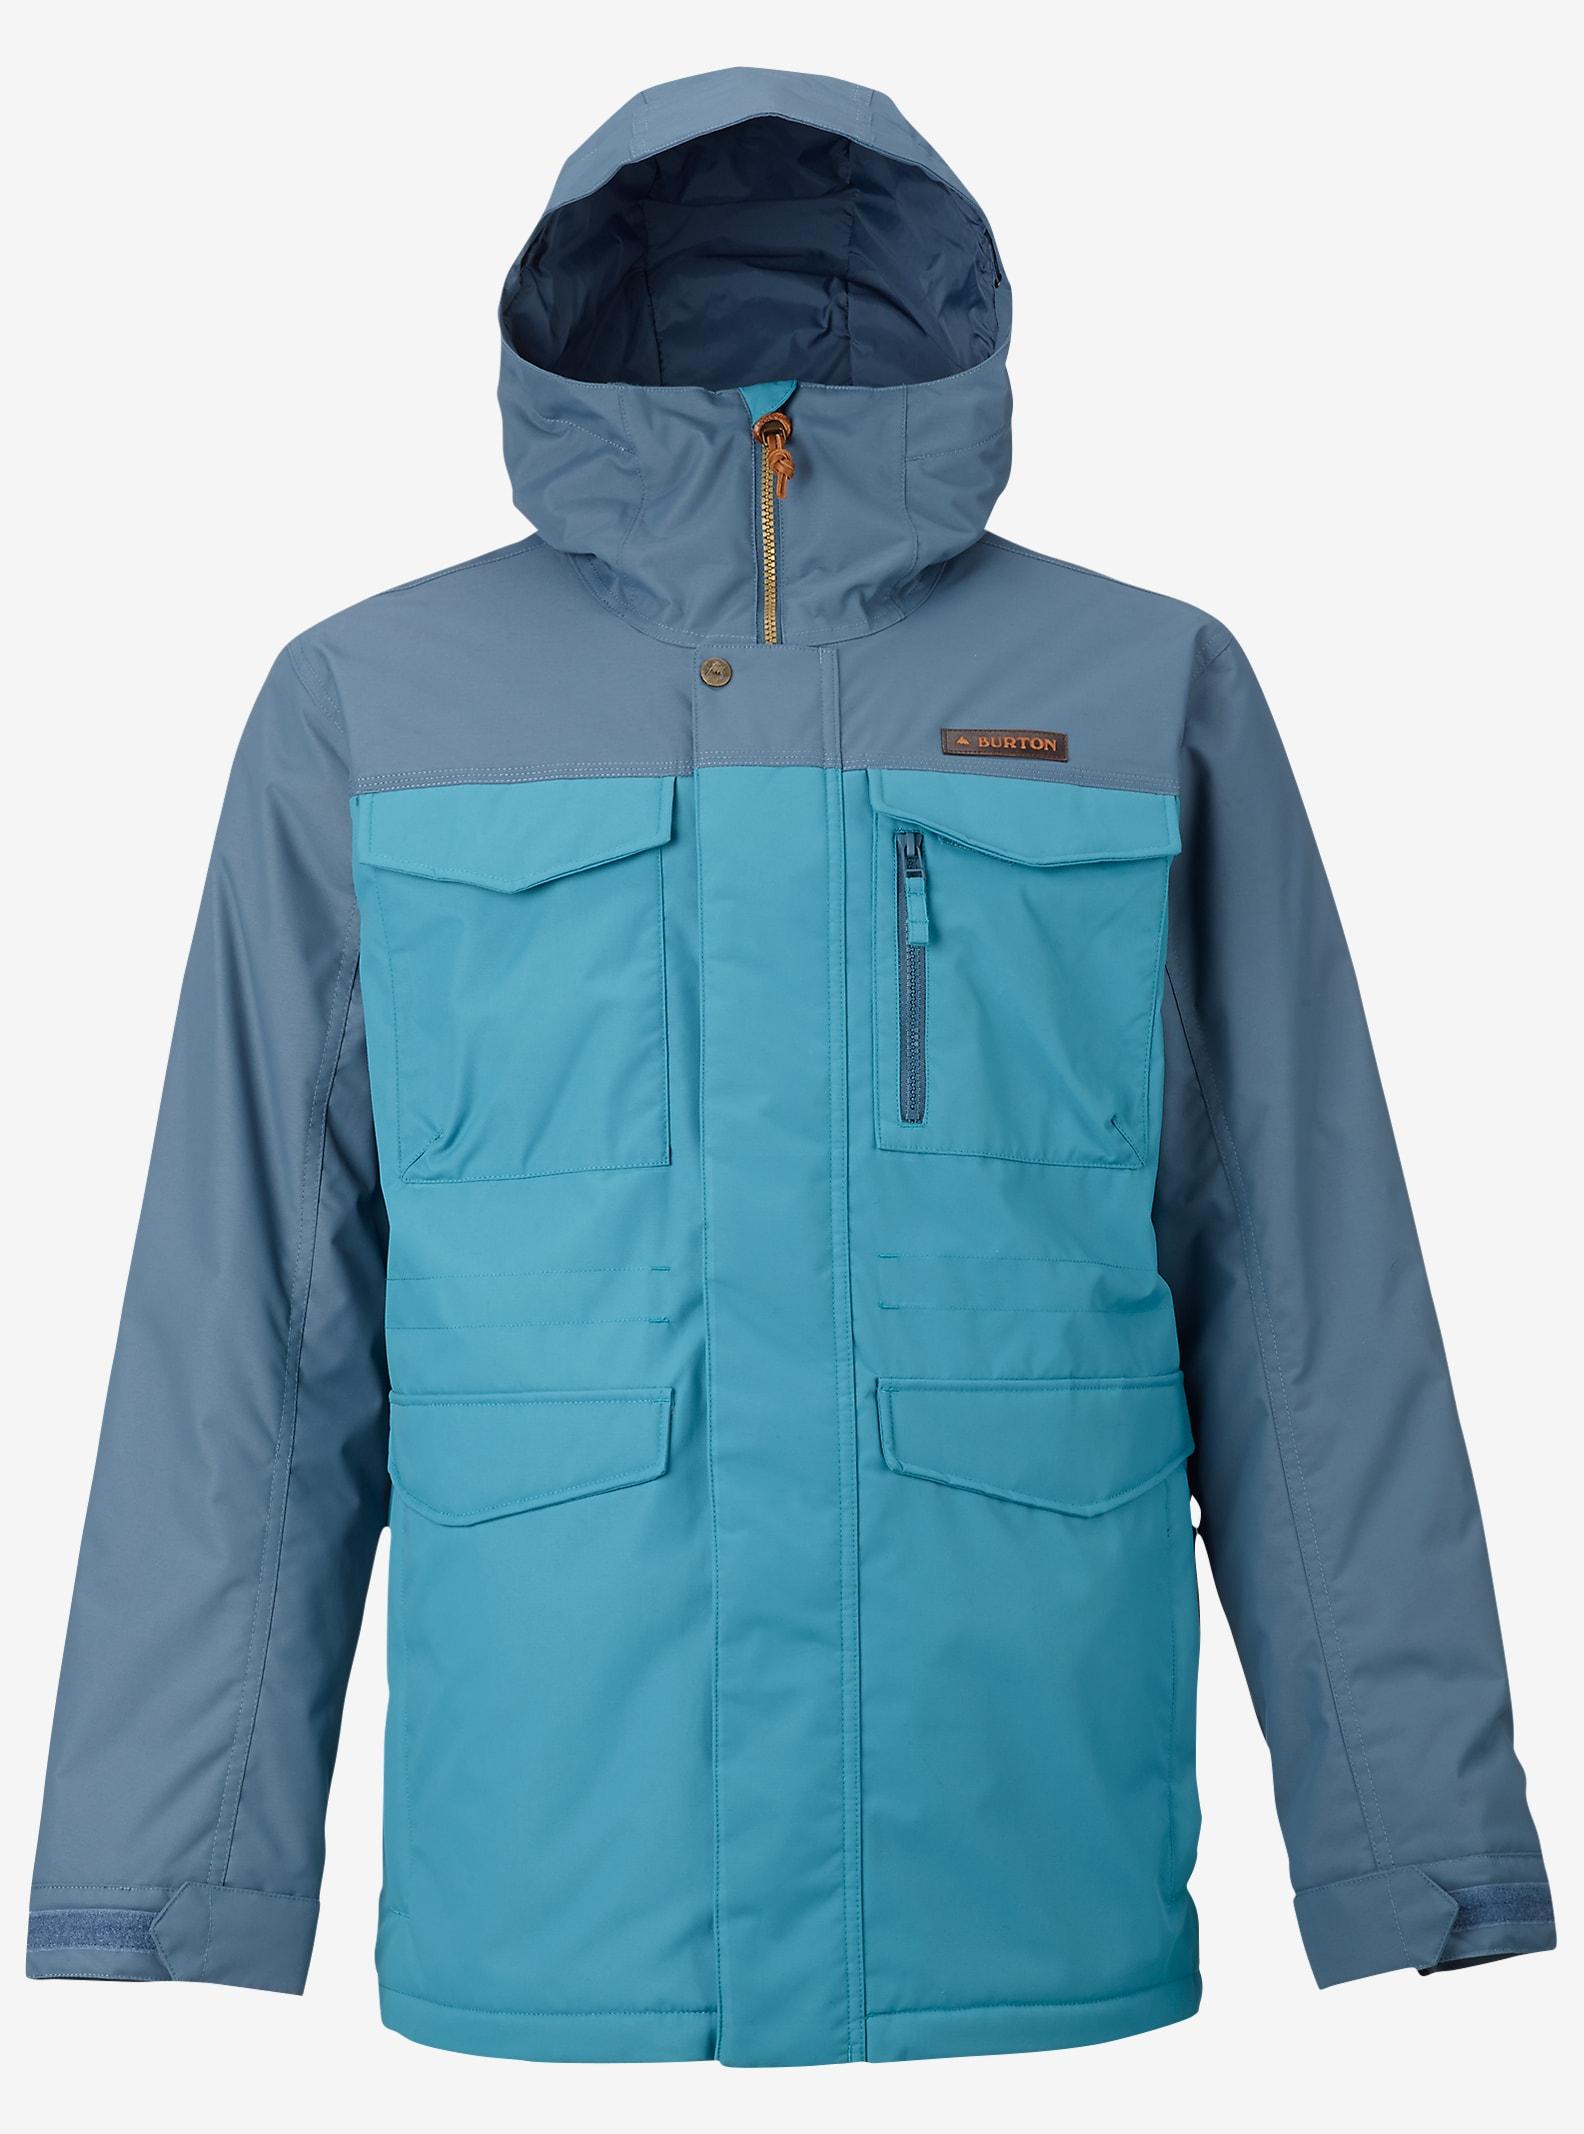 Burton Covert Jacket shown in Washed Blue / Larkspur